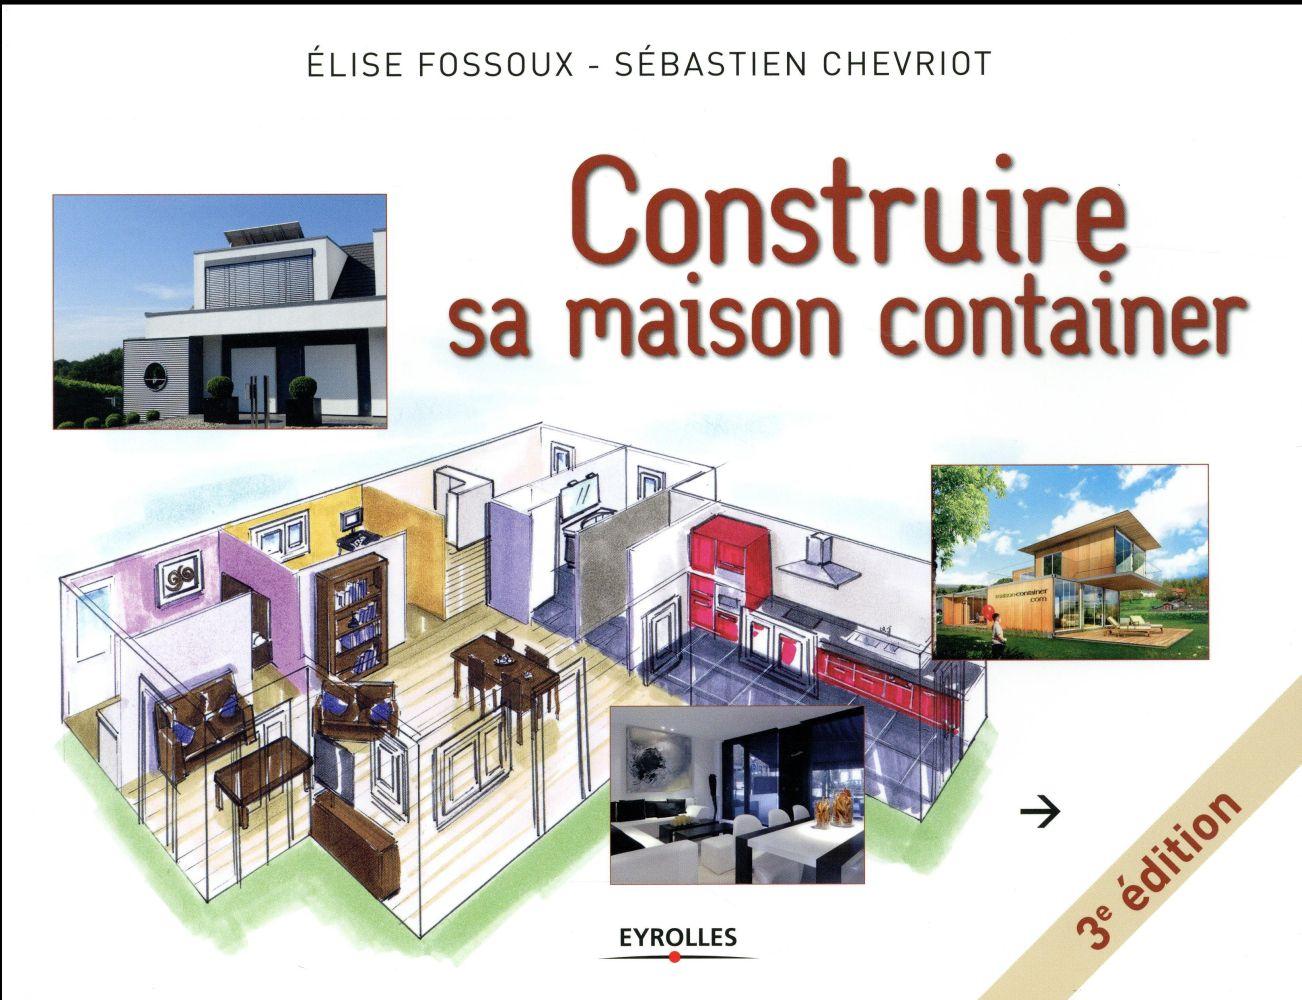 CONSTRUIRE SA MAISON CONTAINER FOSSOUX, ELISE / CHEVRIOT, SEB Eyrolles